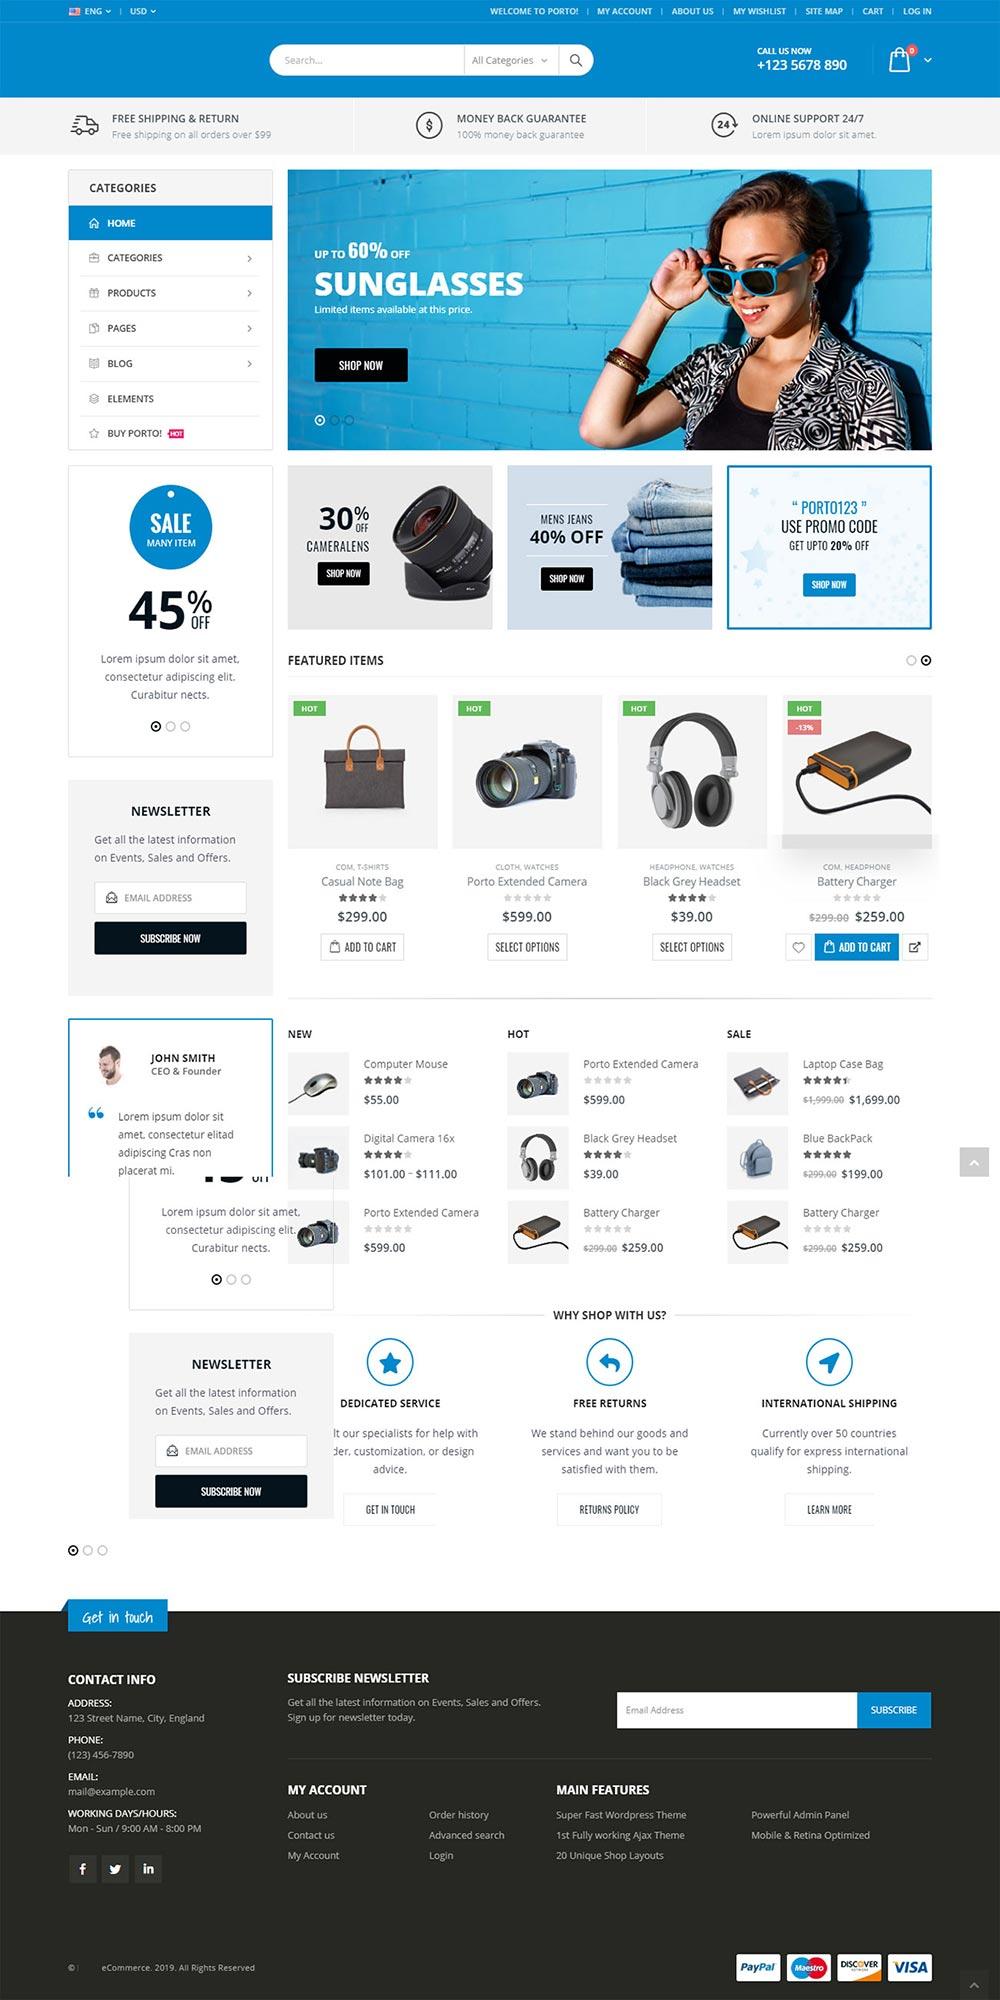 WebTech eCommerce Website Design and Development in Uttara, Dhaka, Bangladesh